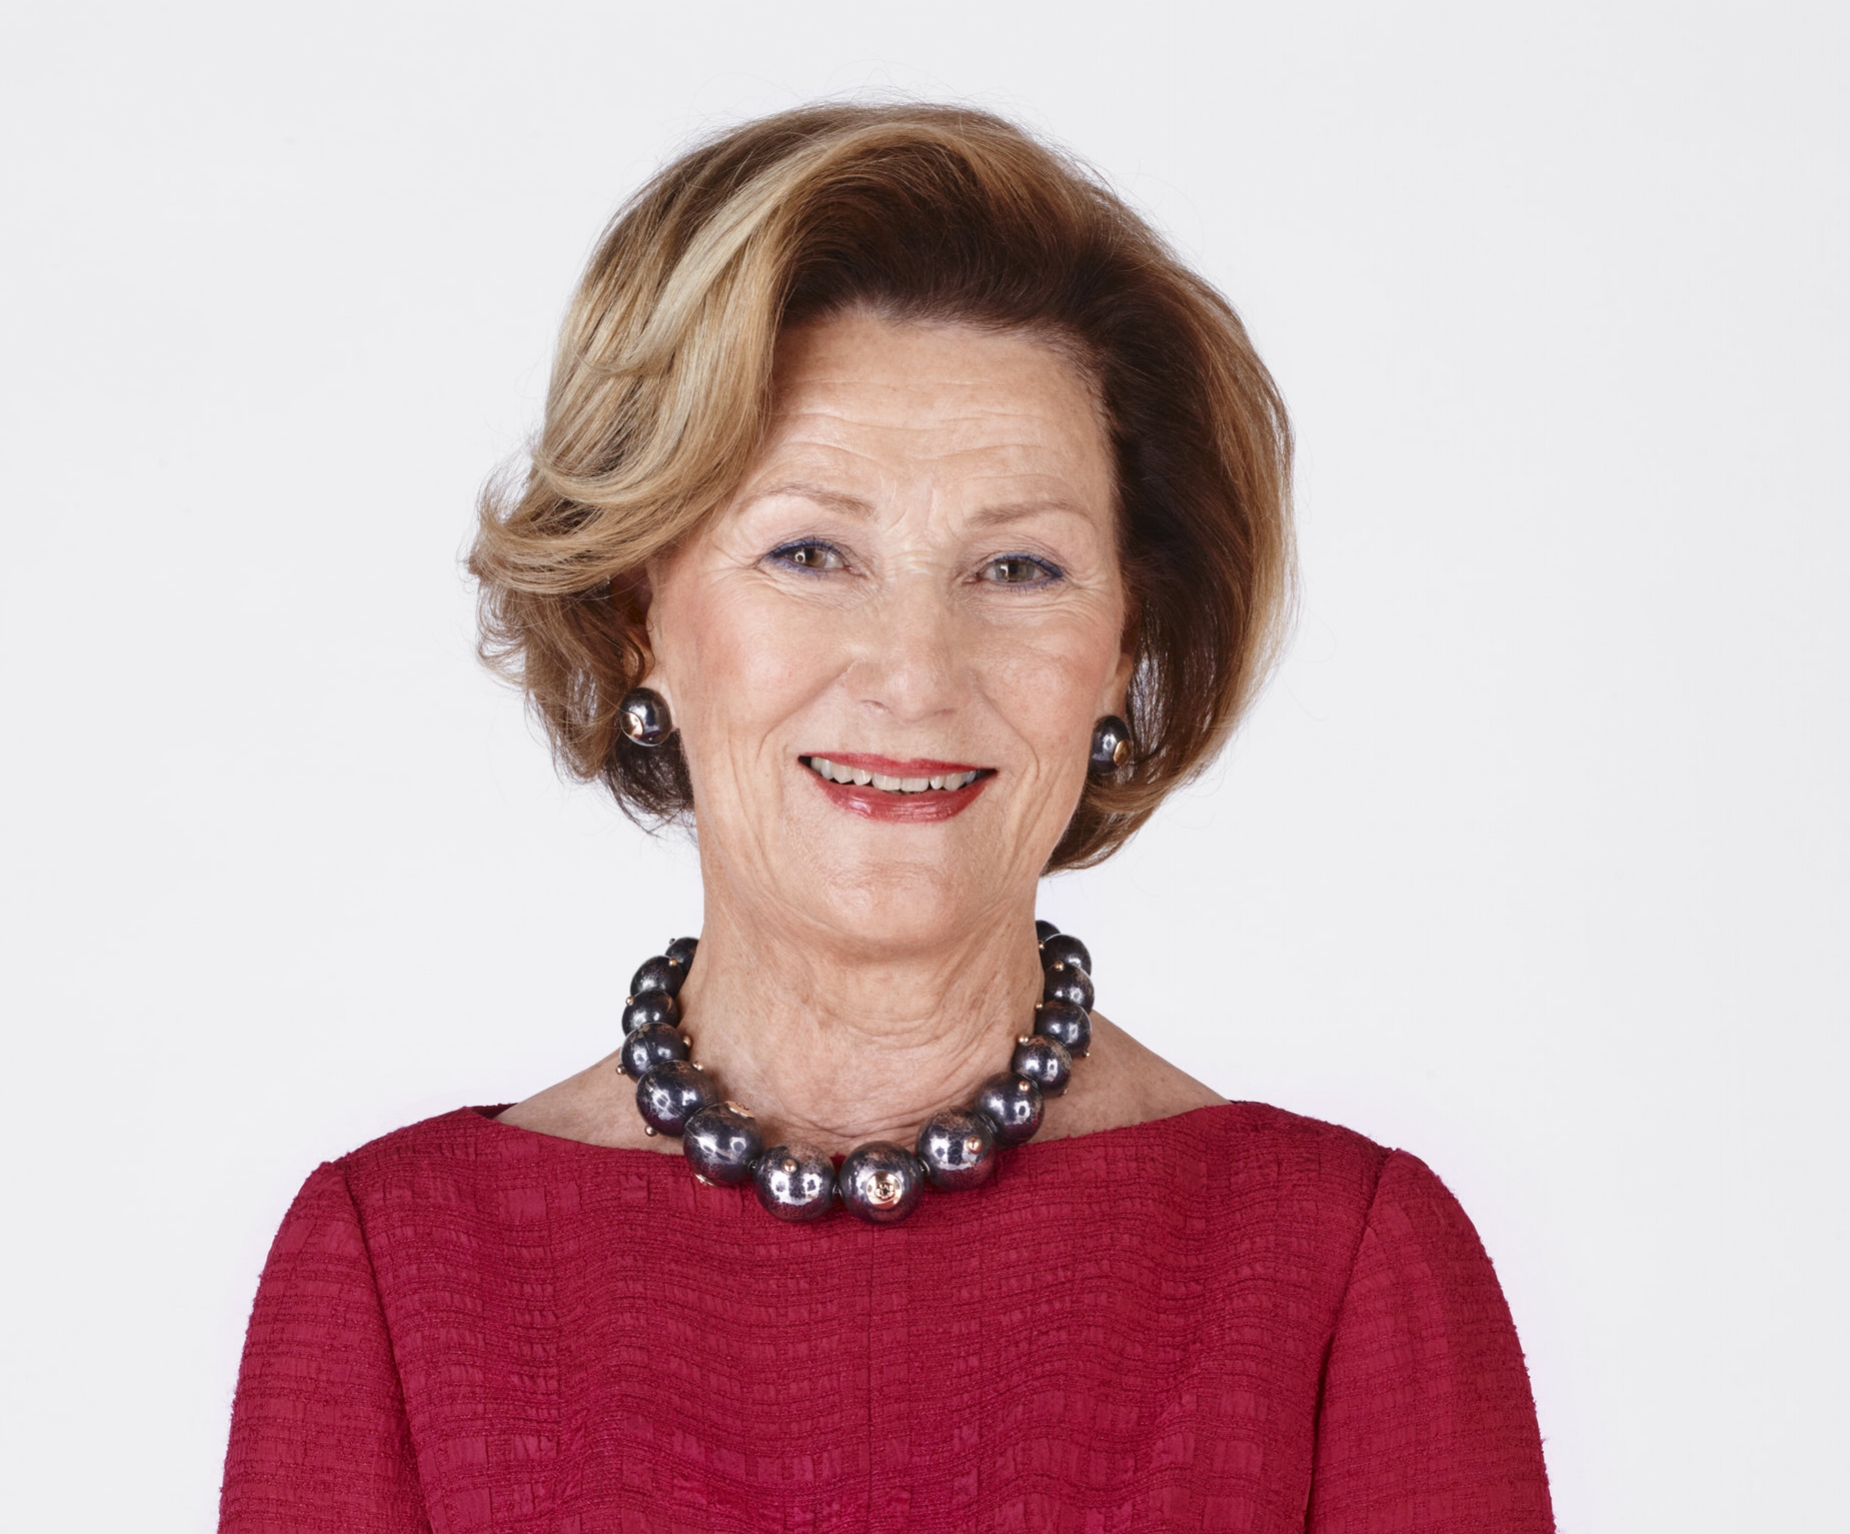 Foto:Jørgen Gomnæs, Det kongelige hoff